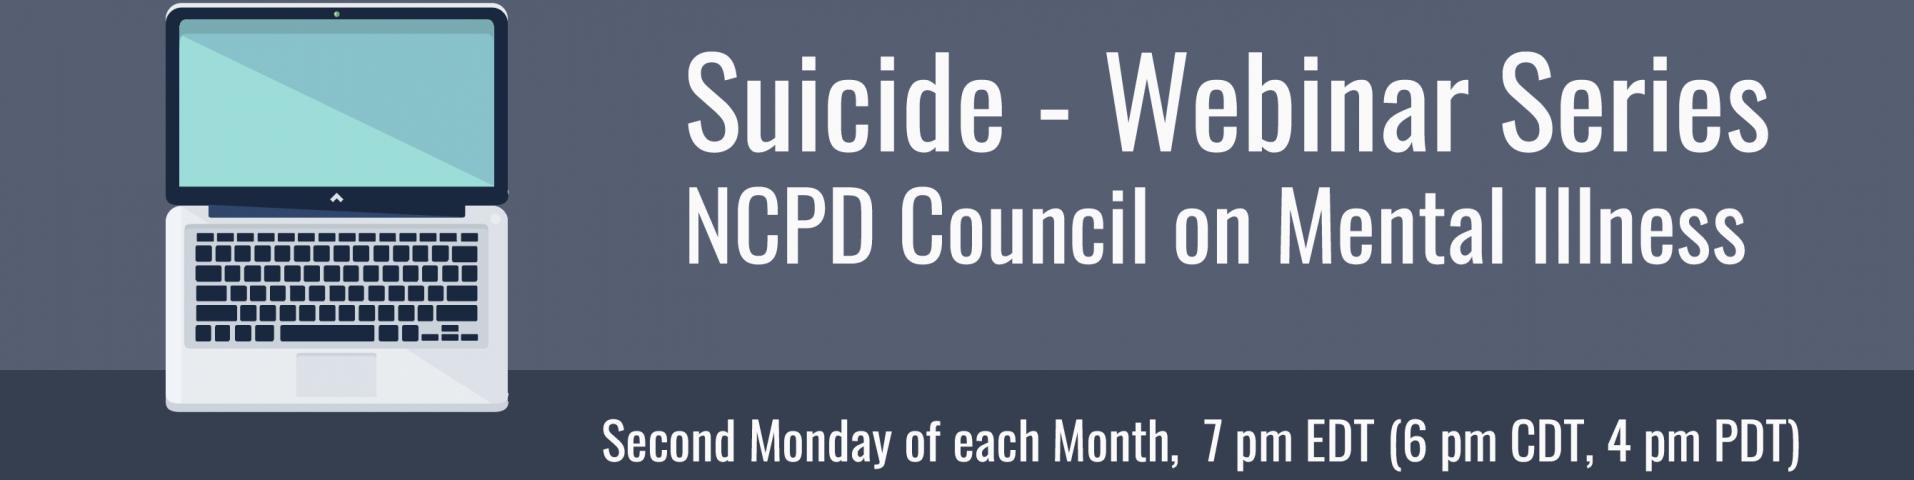 Suicide - Webinar Series